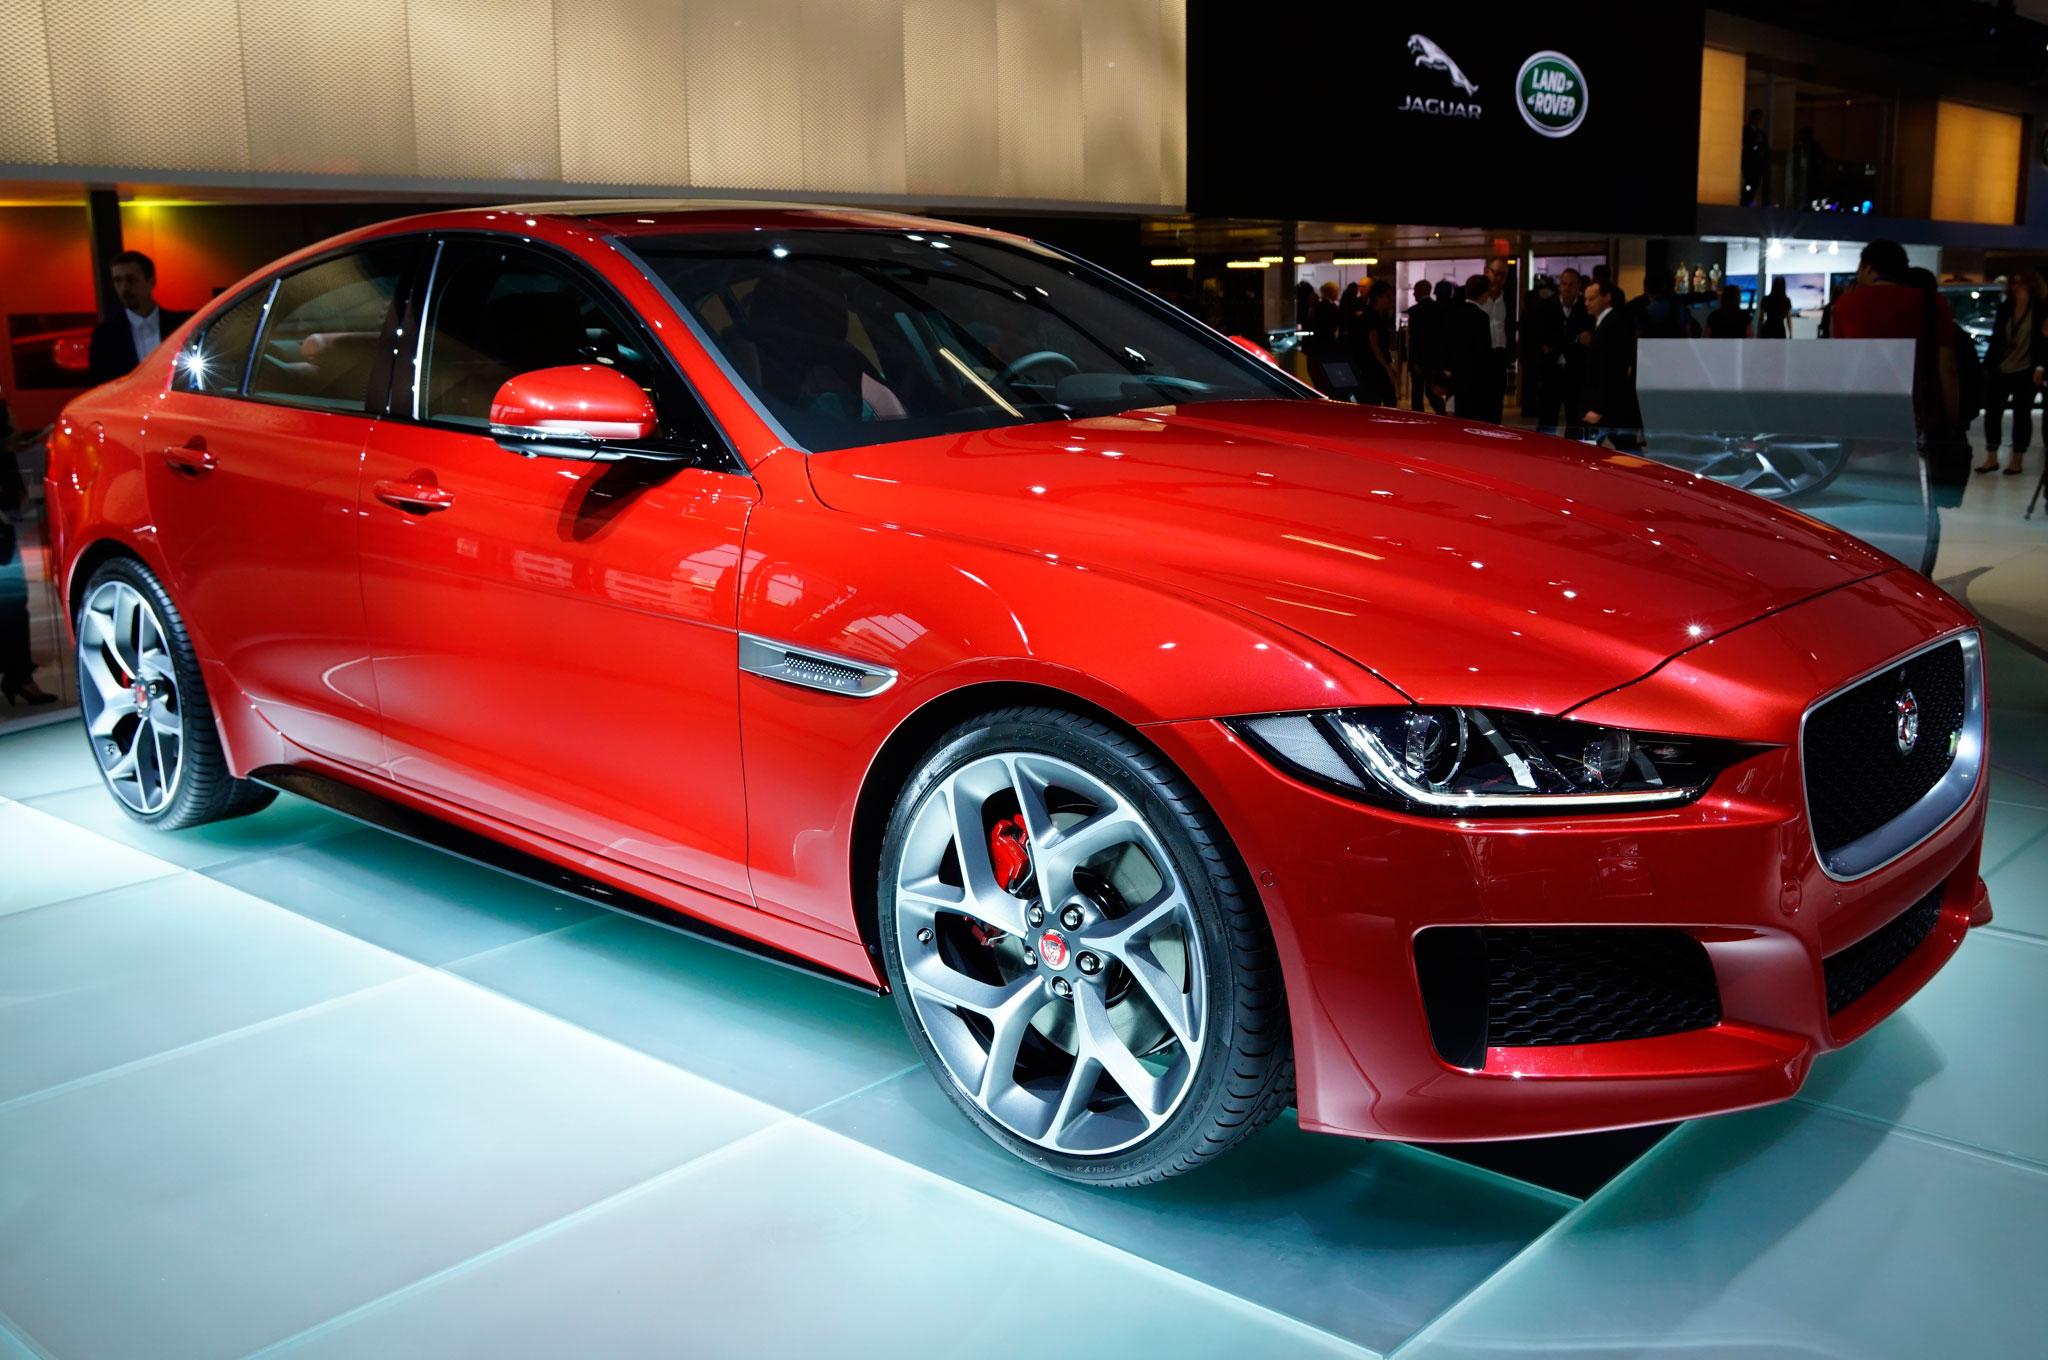 2016 Jaguar XE Front Side Details